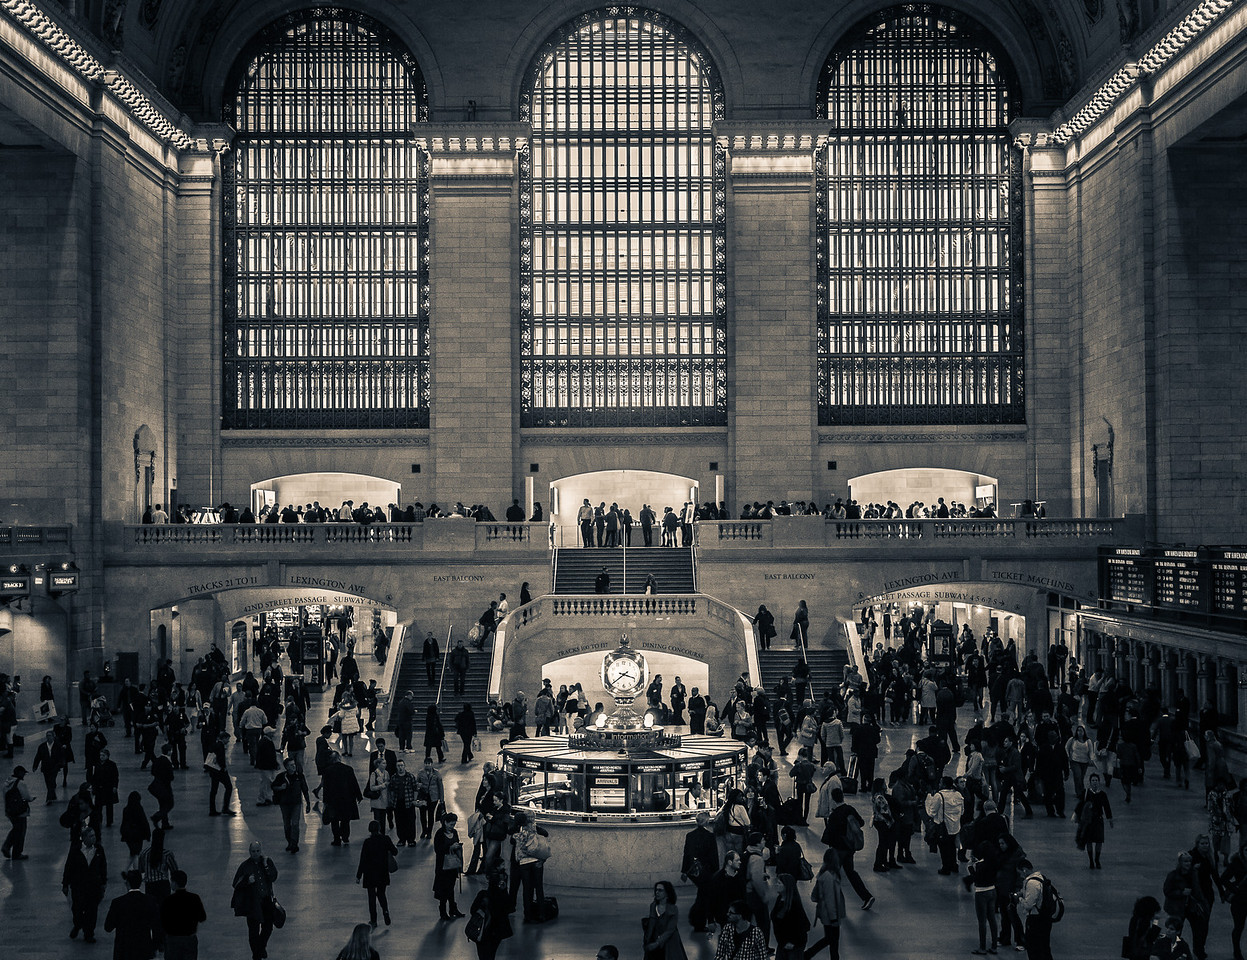 Grand Central Station Centennial